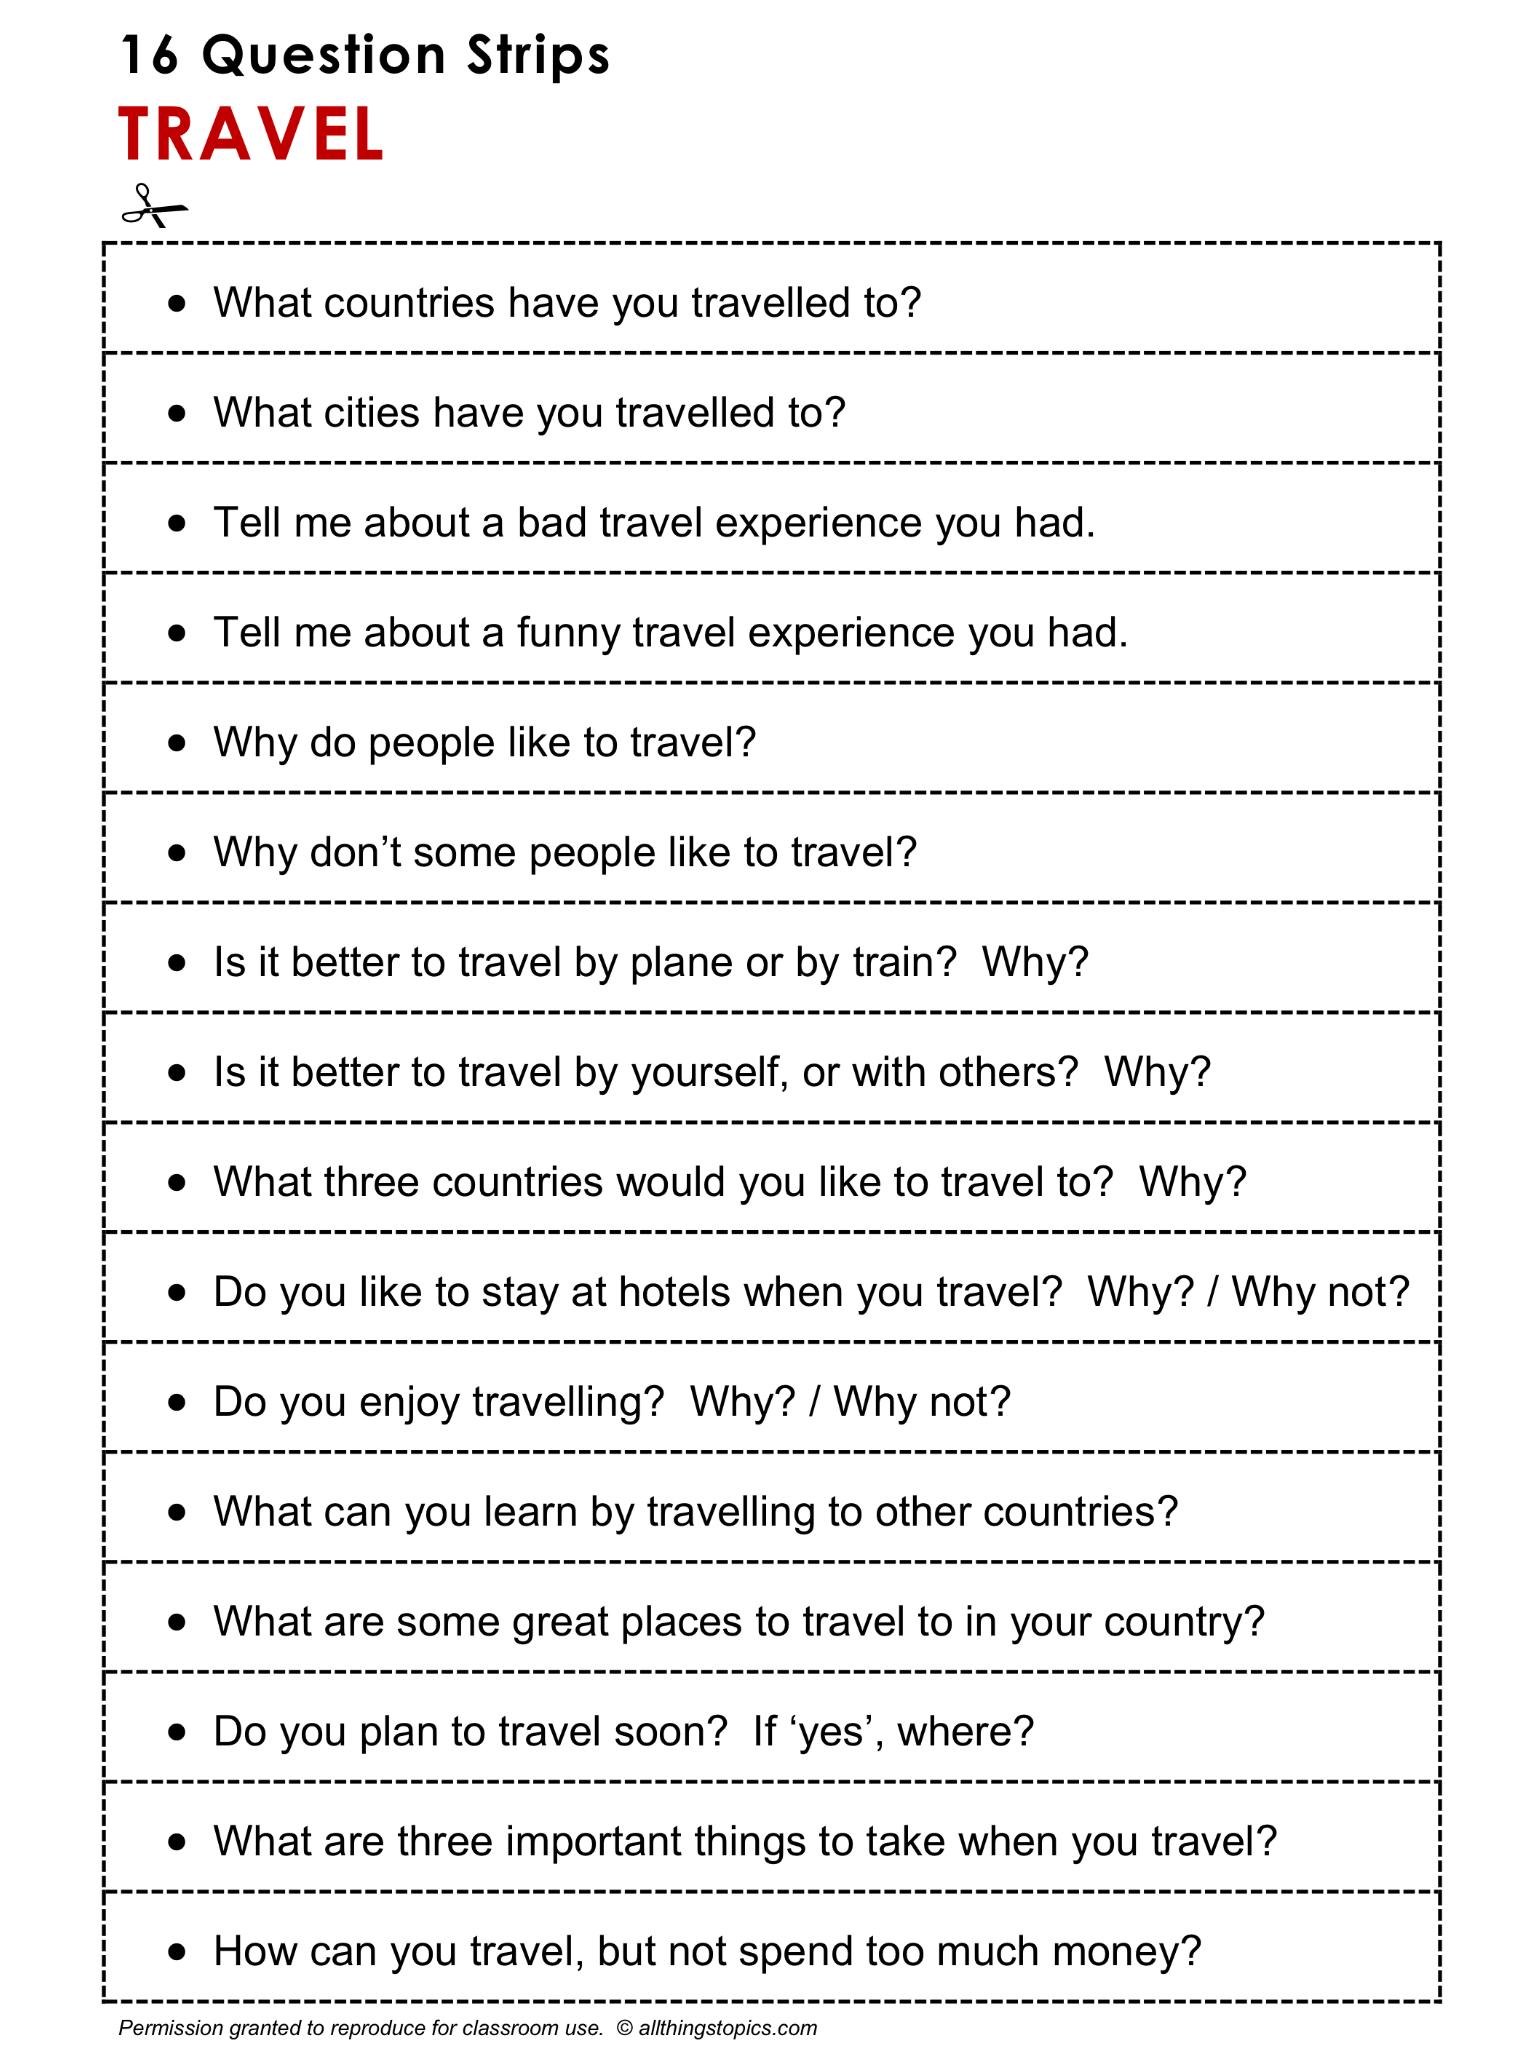 English Grammar Discussion Speaking Practice Travel 16 Question Strips 1 2 Http Www Speaking Activities English English Grammar English Language Teaching [ 2048 x 1536 Pixel ]